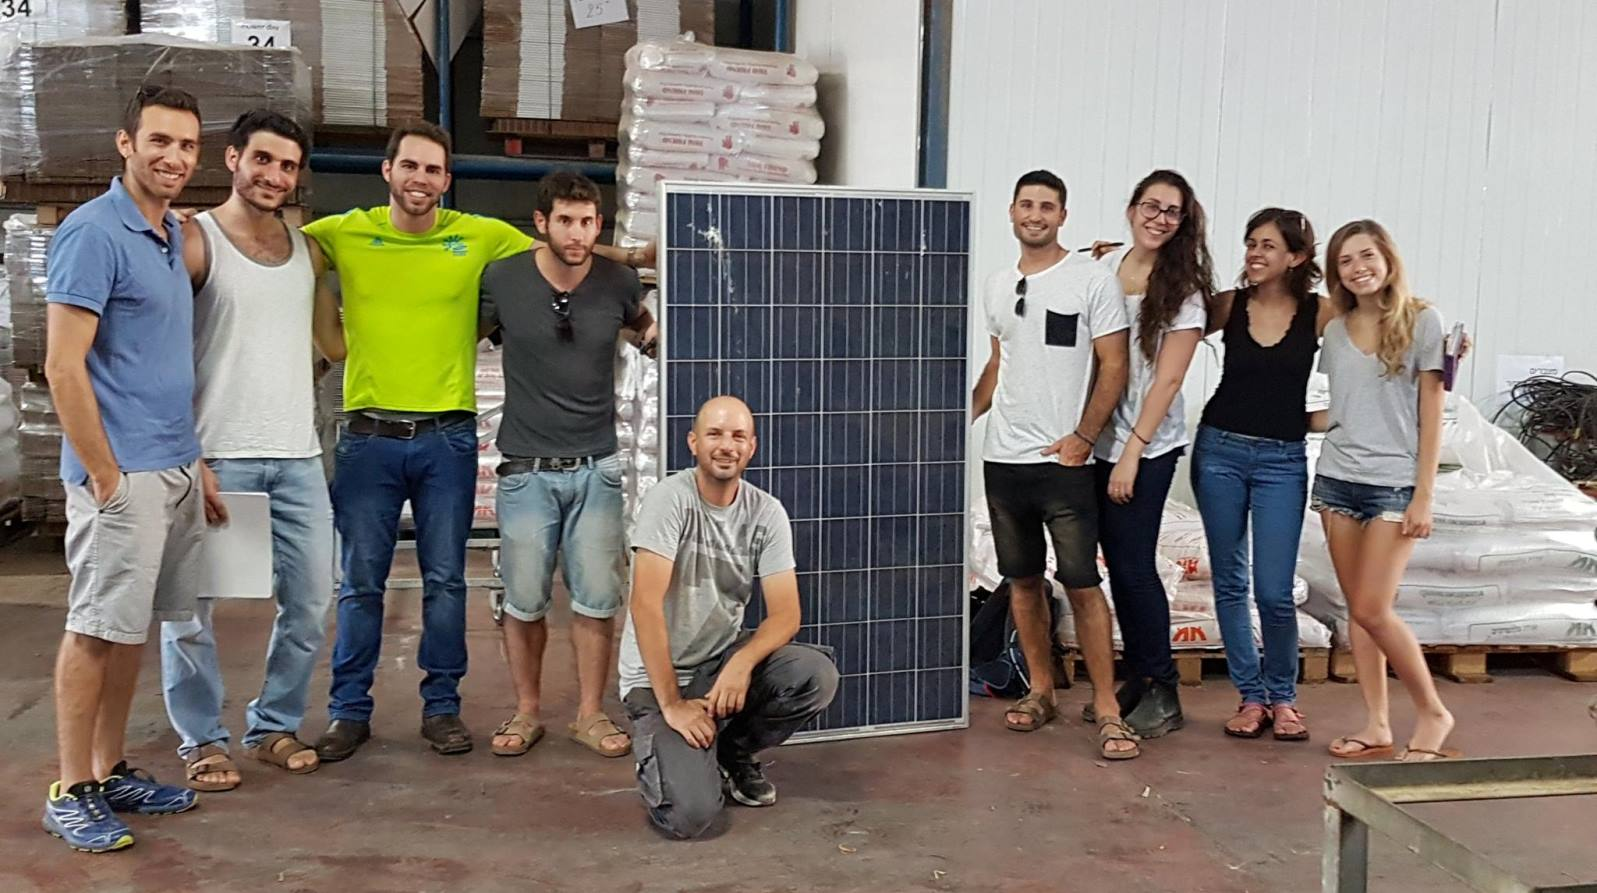 EwB Israel CEO Jonathan Haran with TAU members Adir Shaham, Imry Atzmon, Gil Margalit, Moshe Gurfinkel, Raz Cohen, Adi Mayersohn, Inbal Tamir and Gal Aviram at the headquarters of Ormash Solar. Photo: courtesy